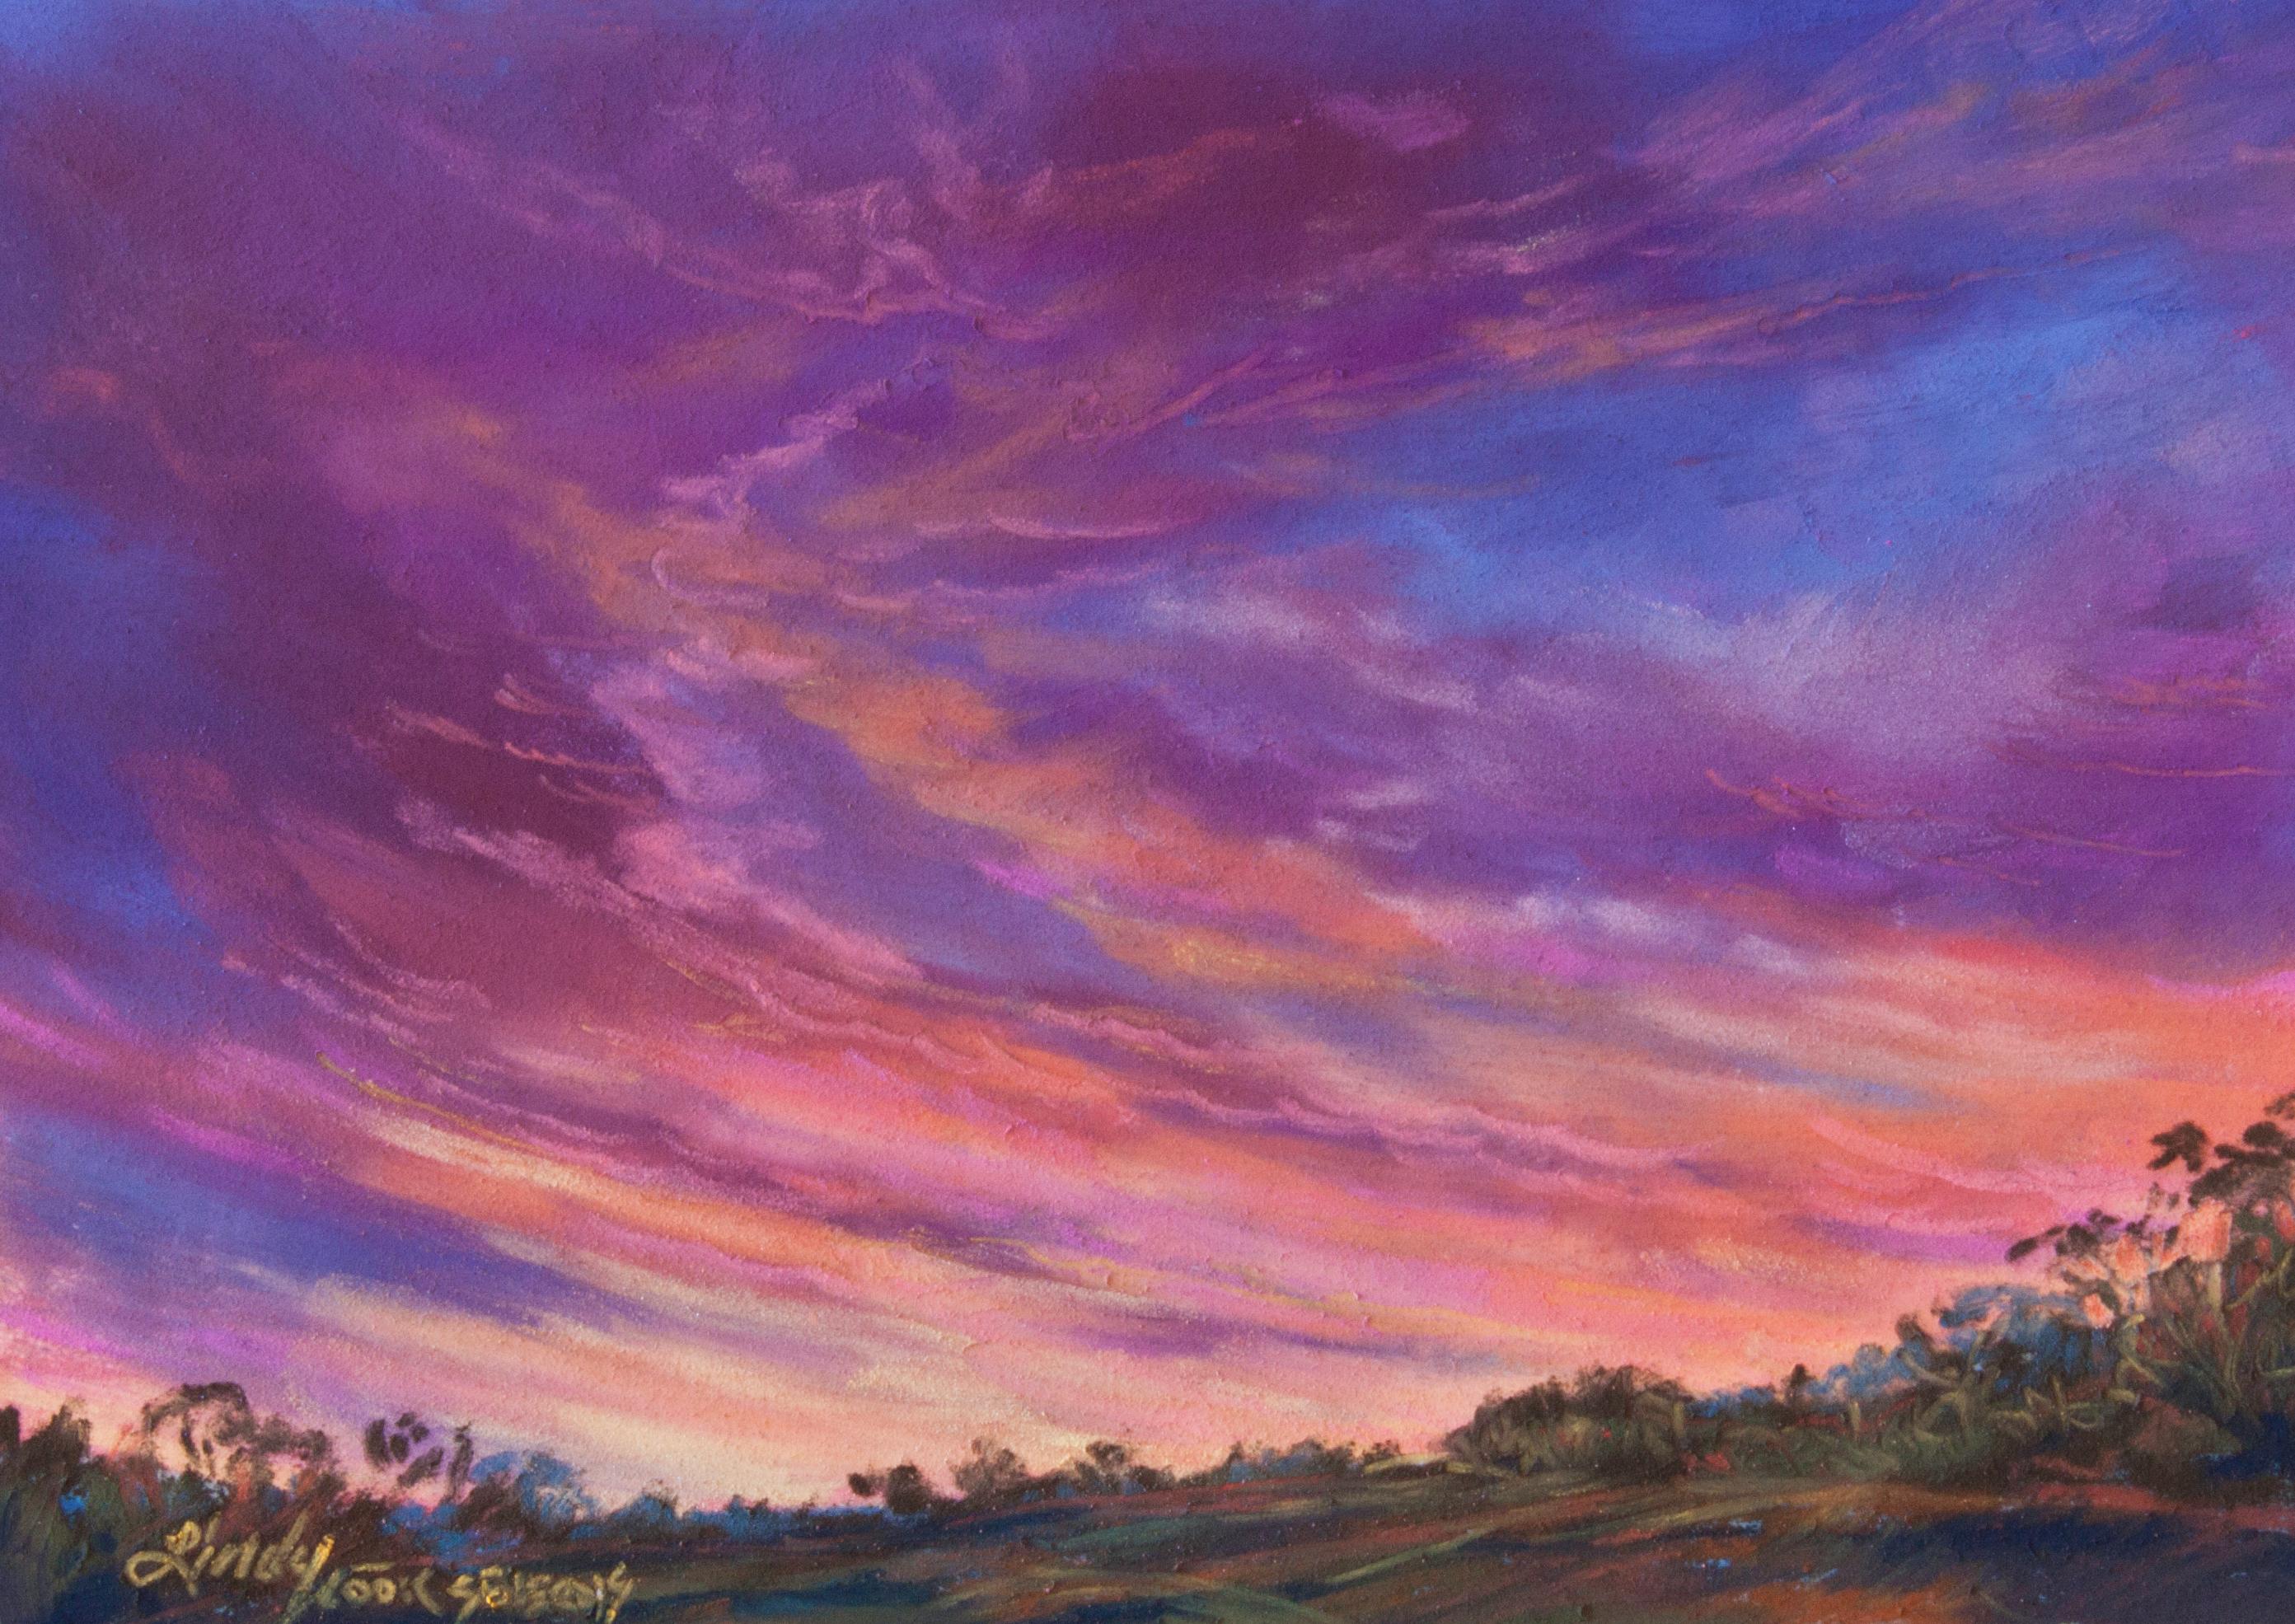 8c14 color my world sunsets 5x7pastel lindy c severns edit vxq0rn